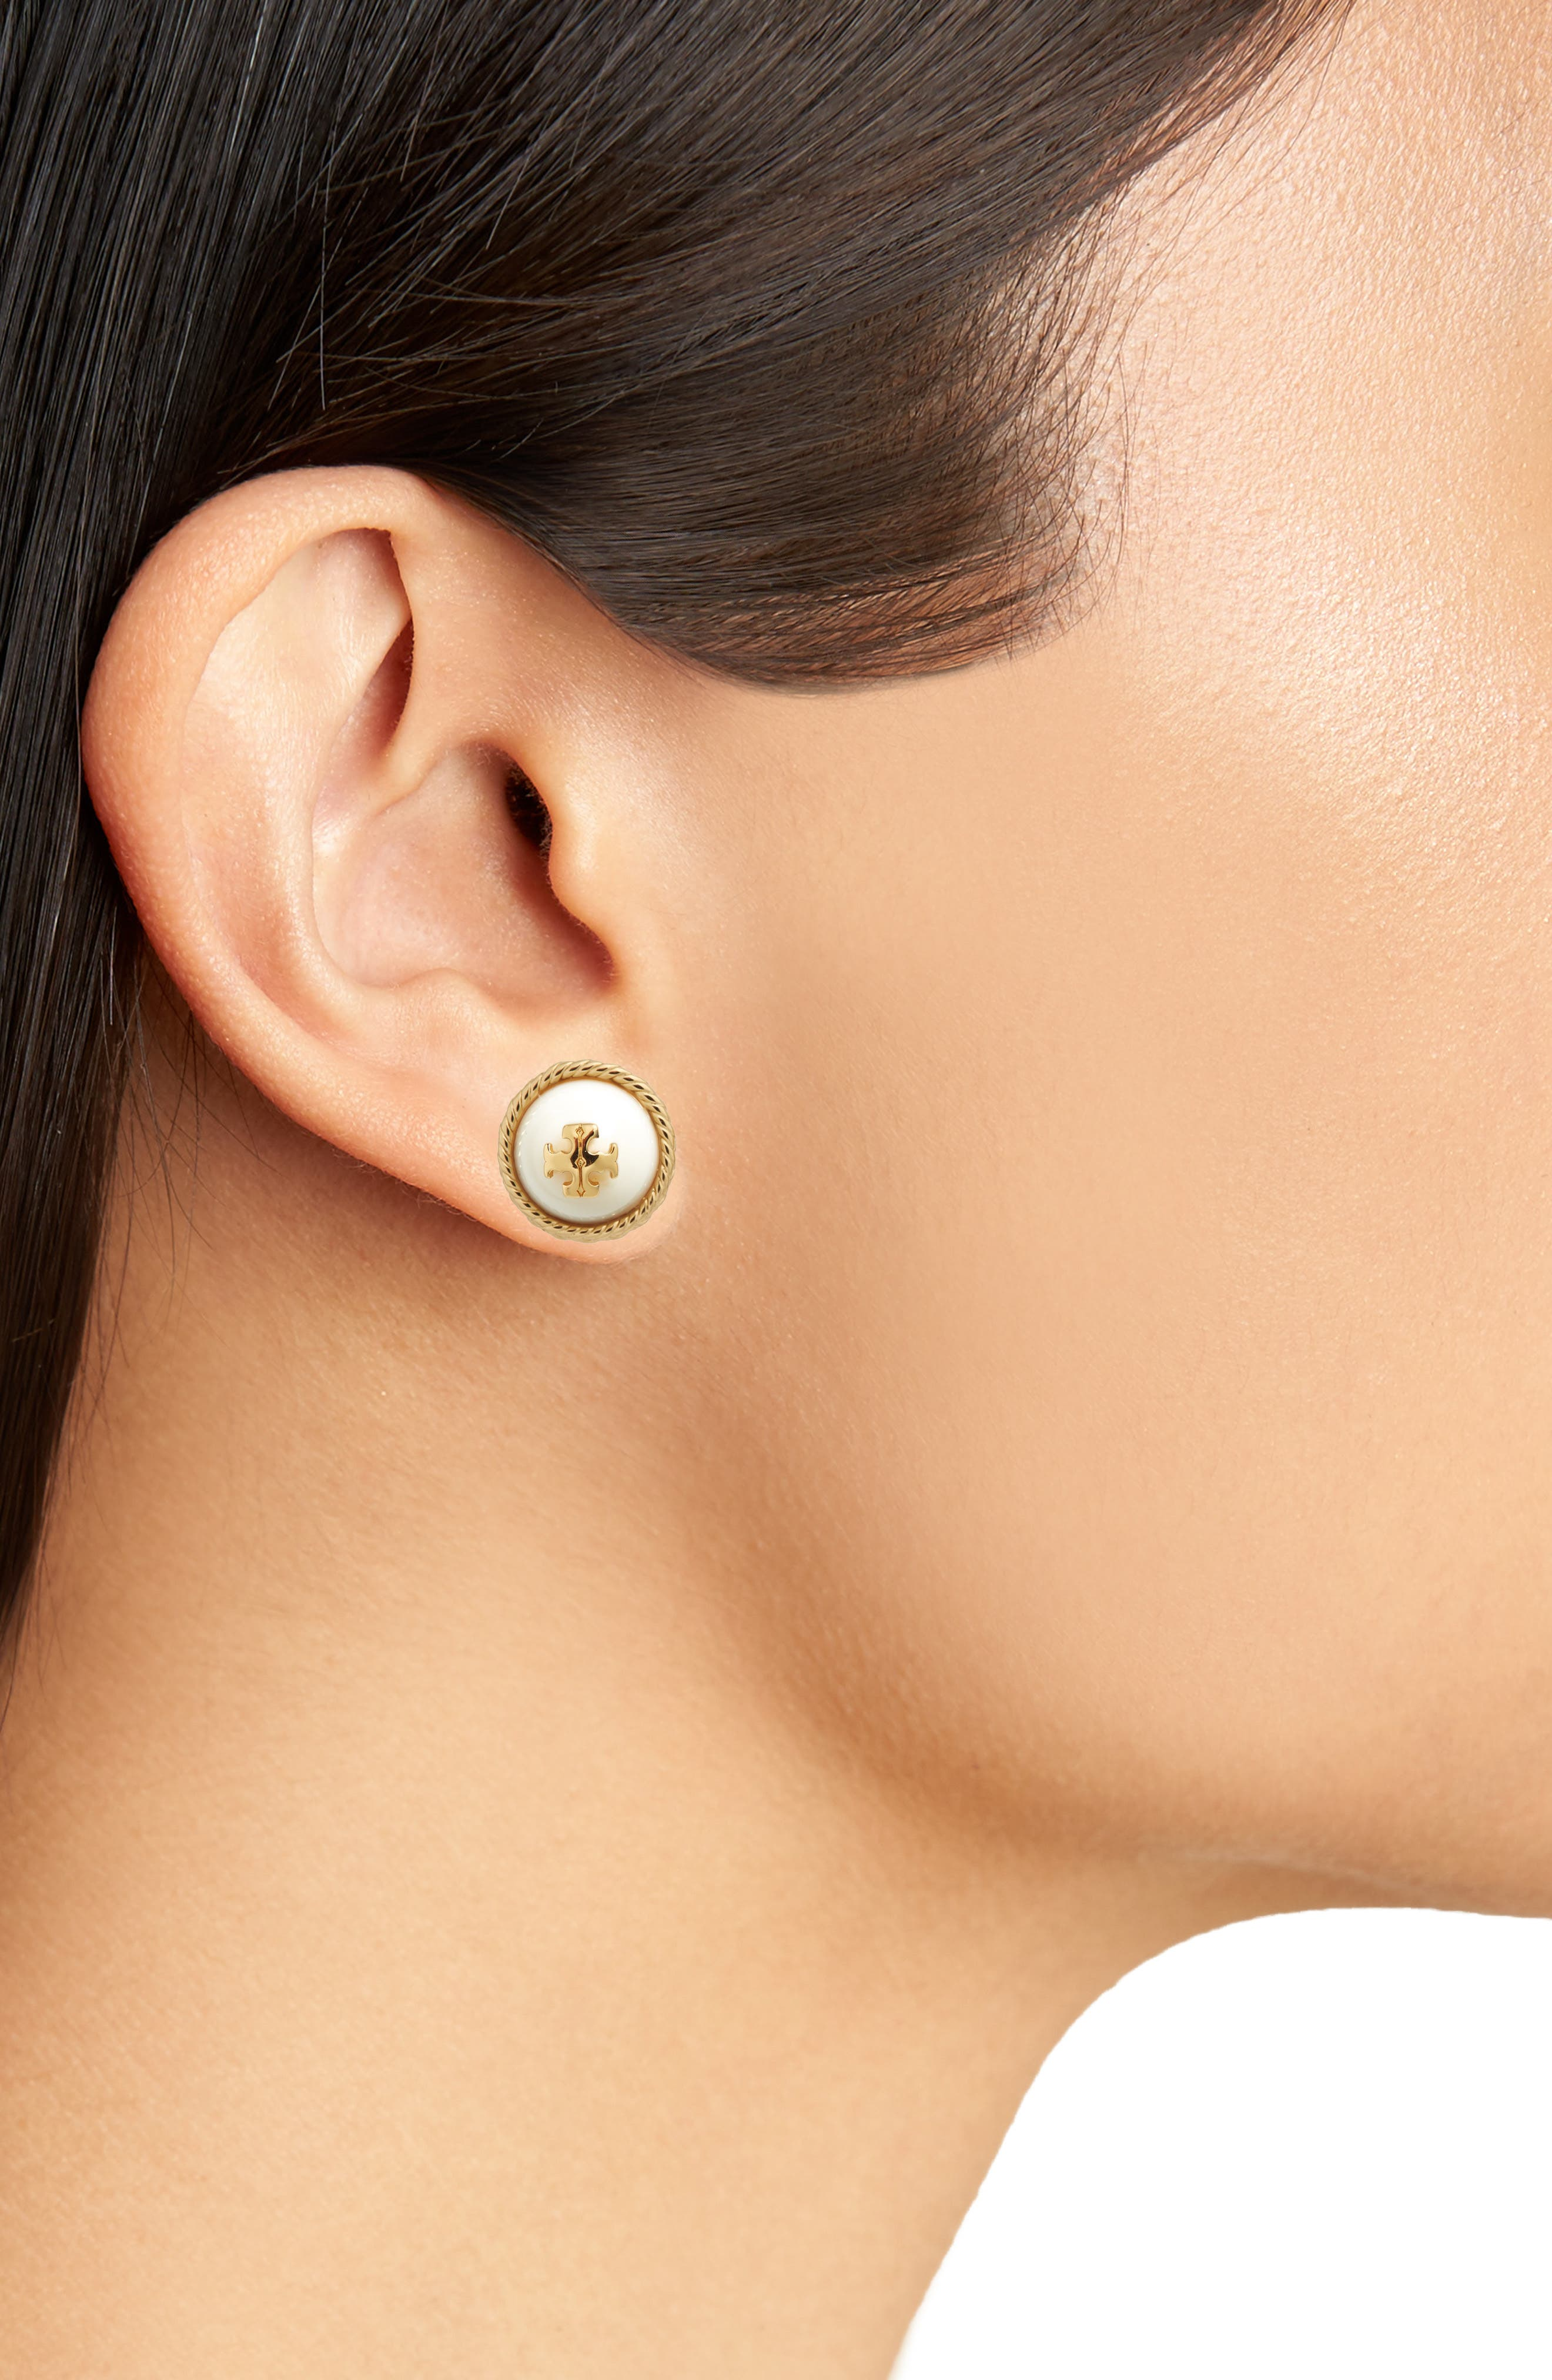 Rope Stud Earrings,                             Alternate thumbnail 2, color,                             900